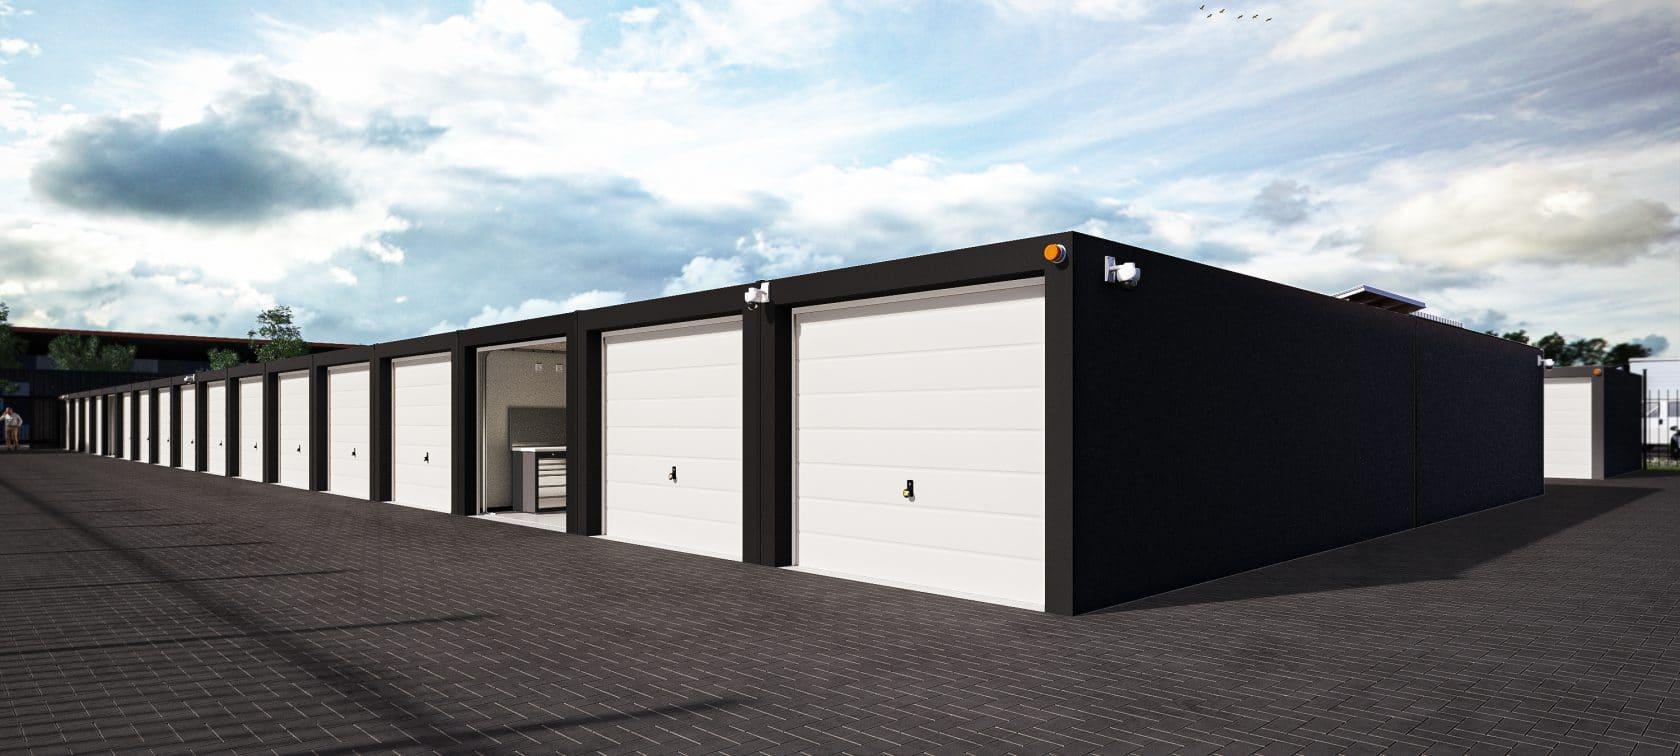 GaragePark Groningen - garageboxen Groningen 3